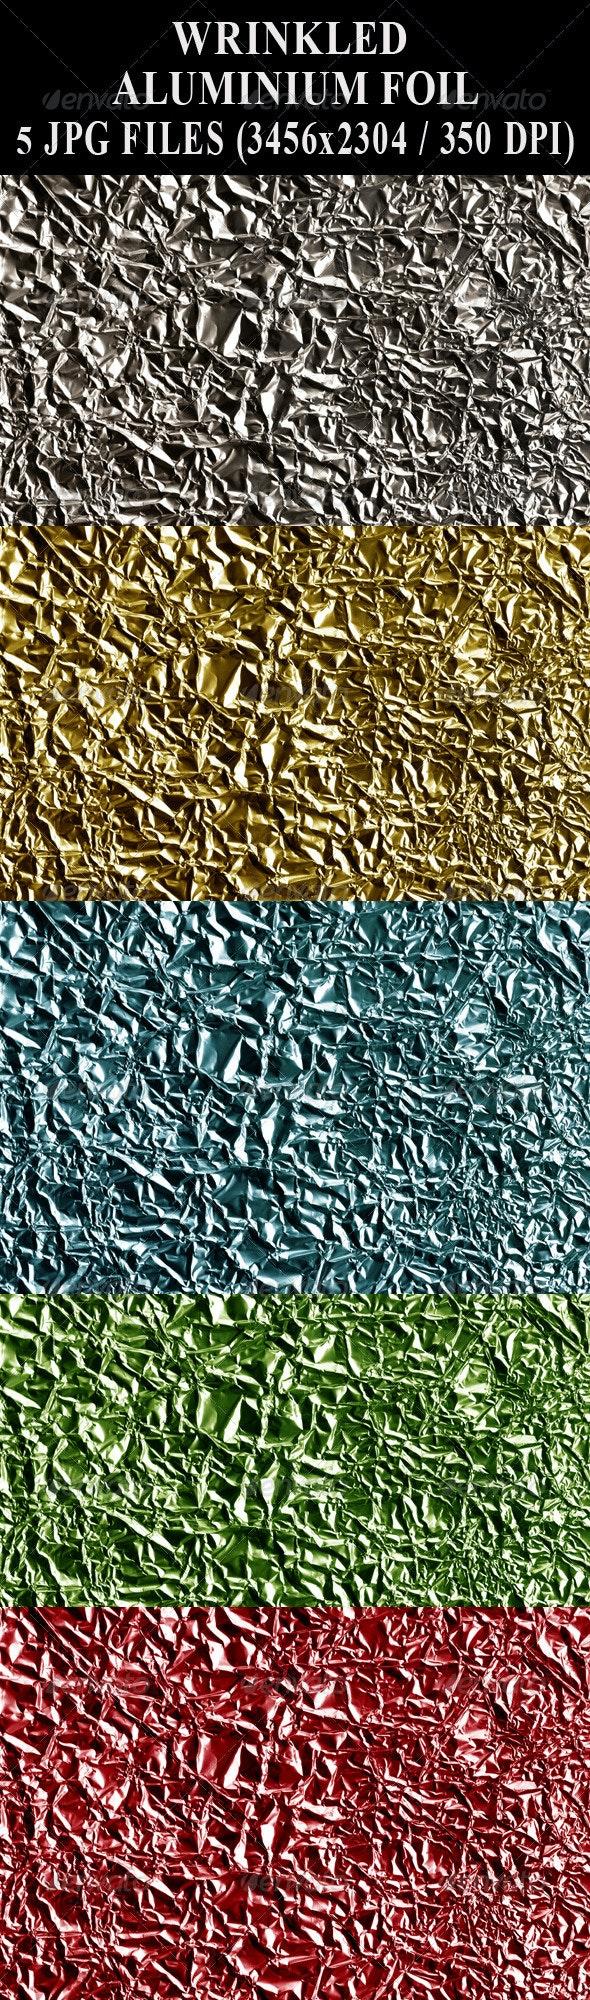 Wrinkled Aluminium Foil - Industrial / Grunge Textures